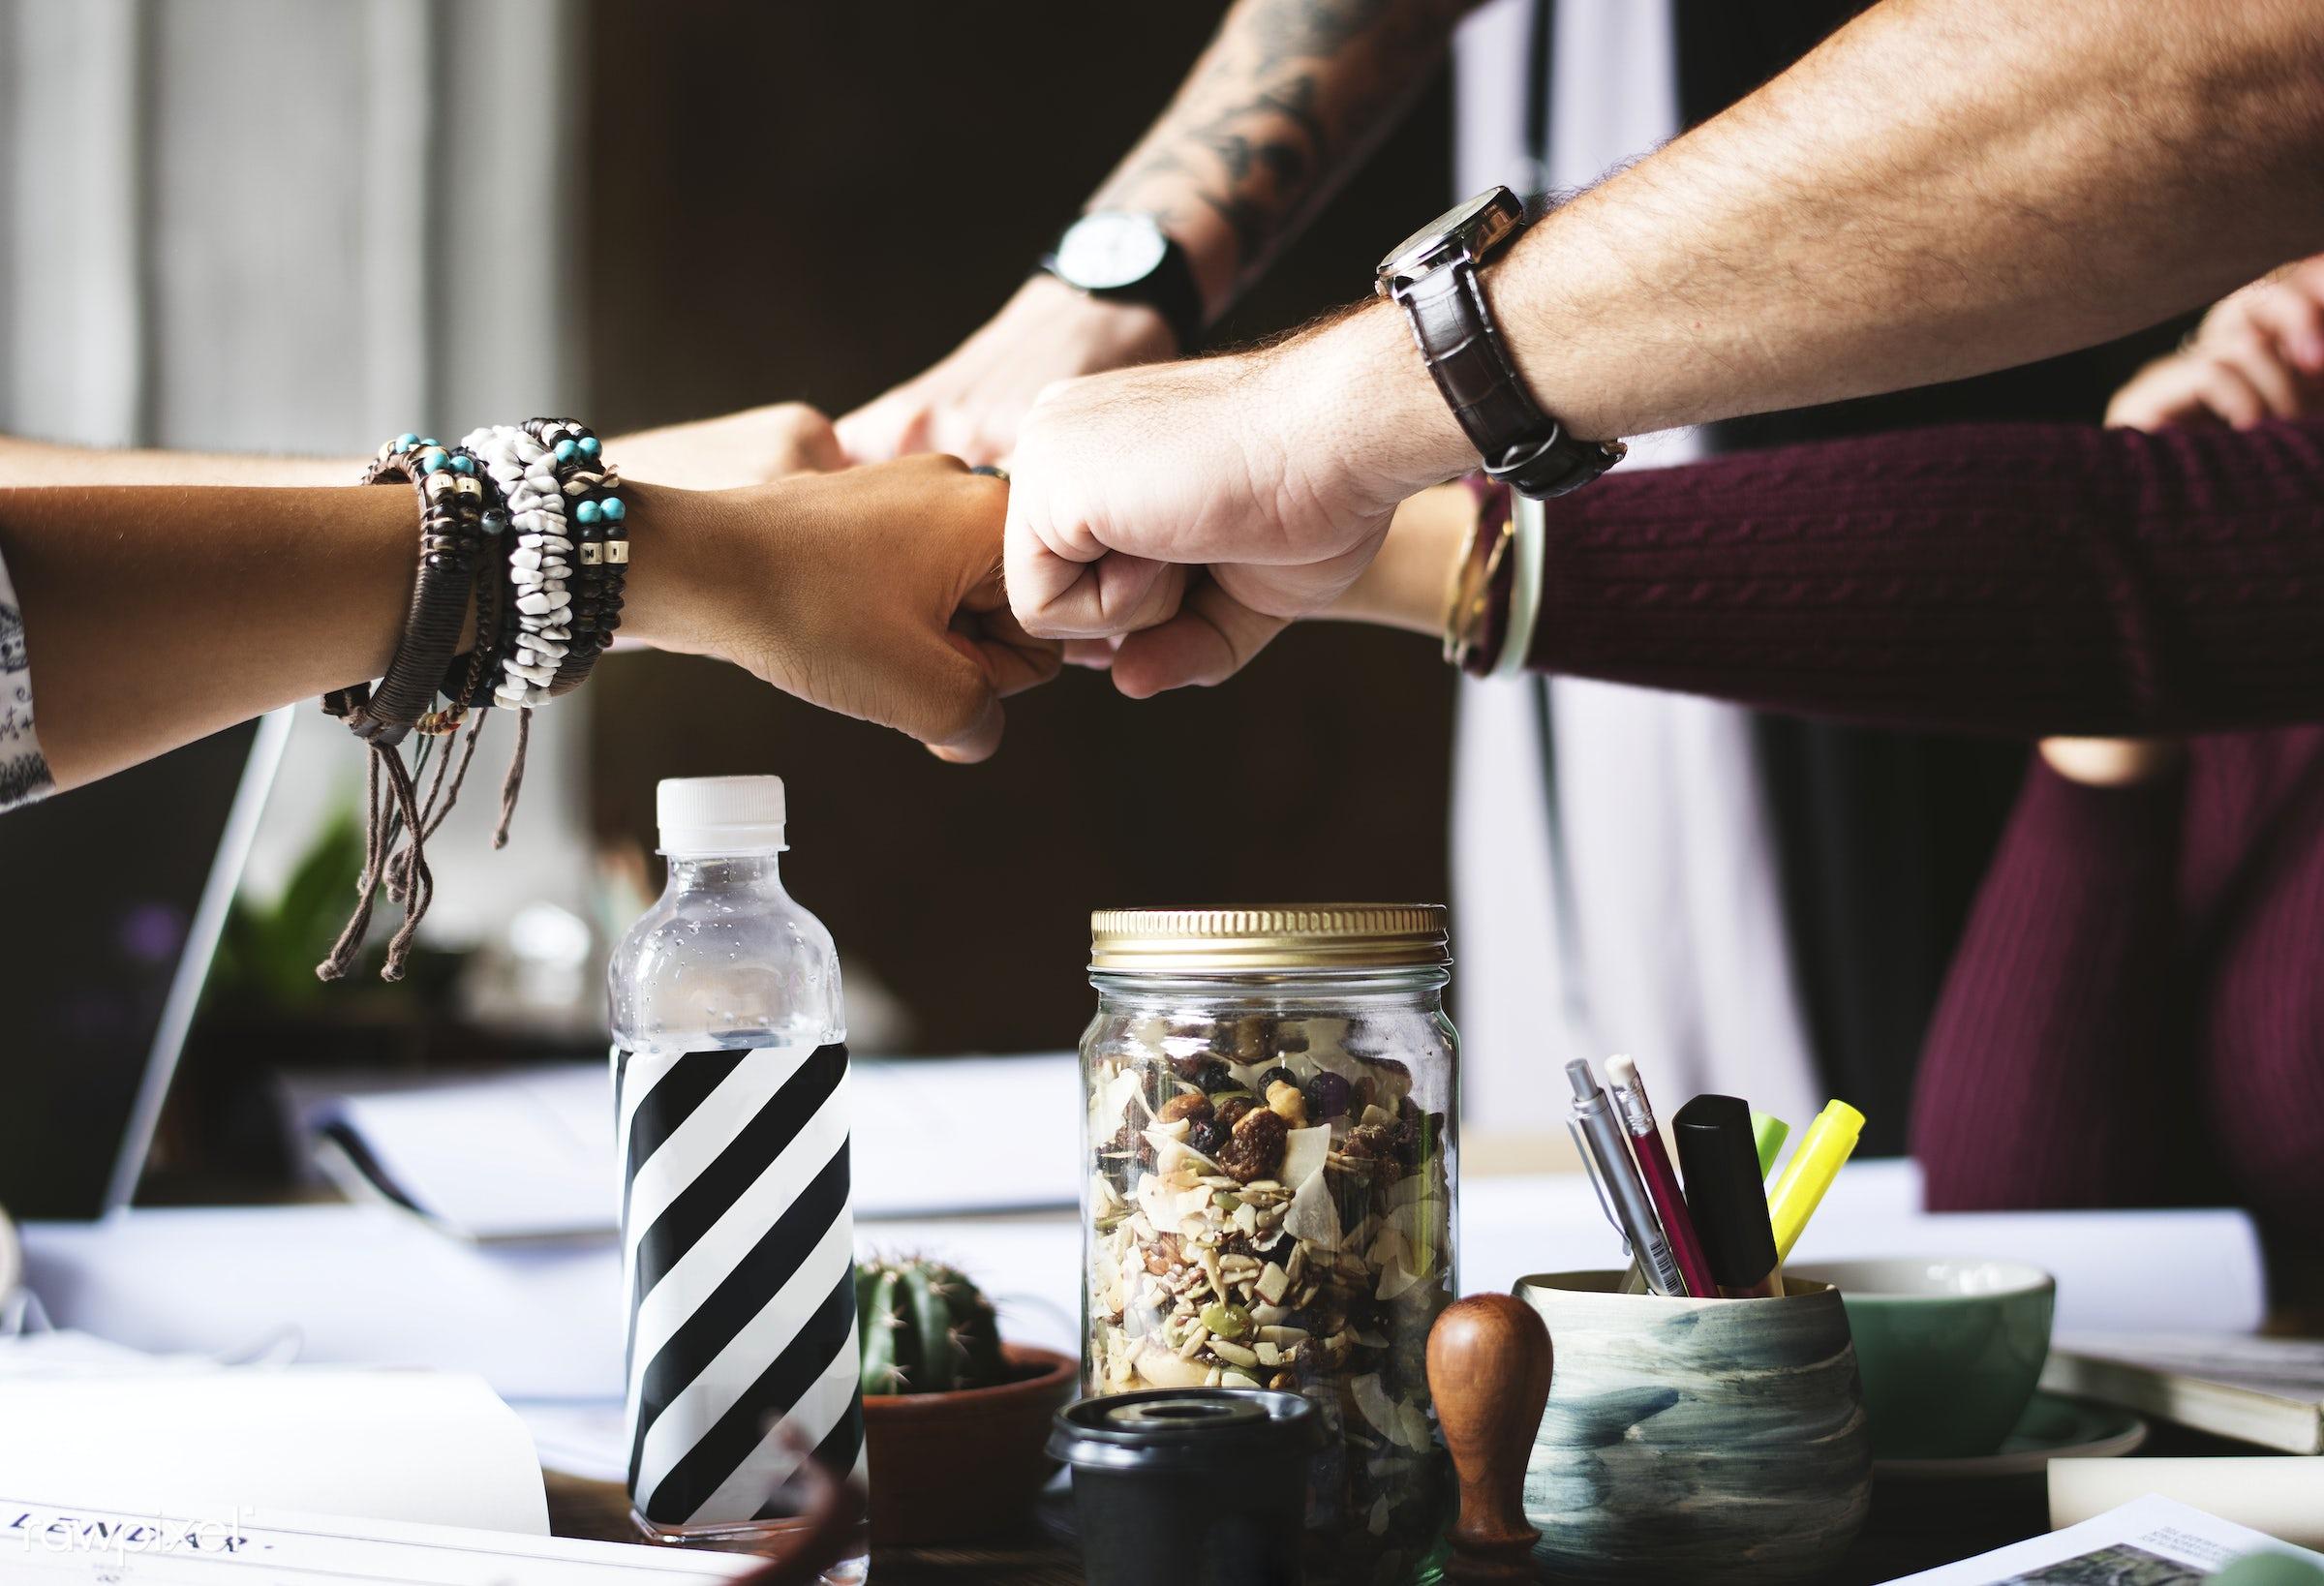 desk, teamwork, hands, cooperation, closeup, team, table, colleagues, startup, unity, fist, group, fist bump, creative...